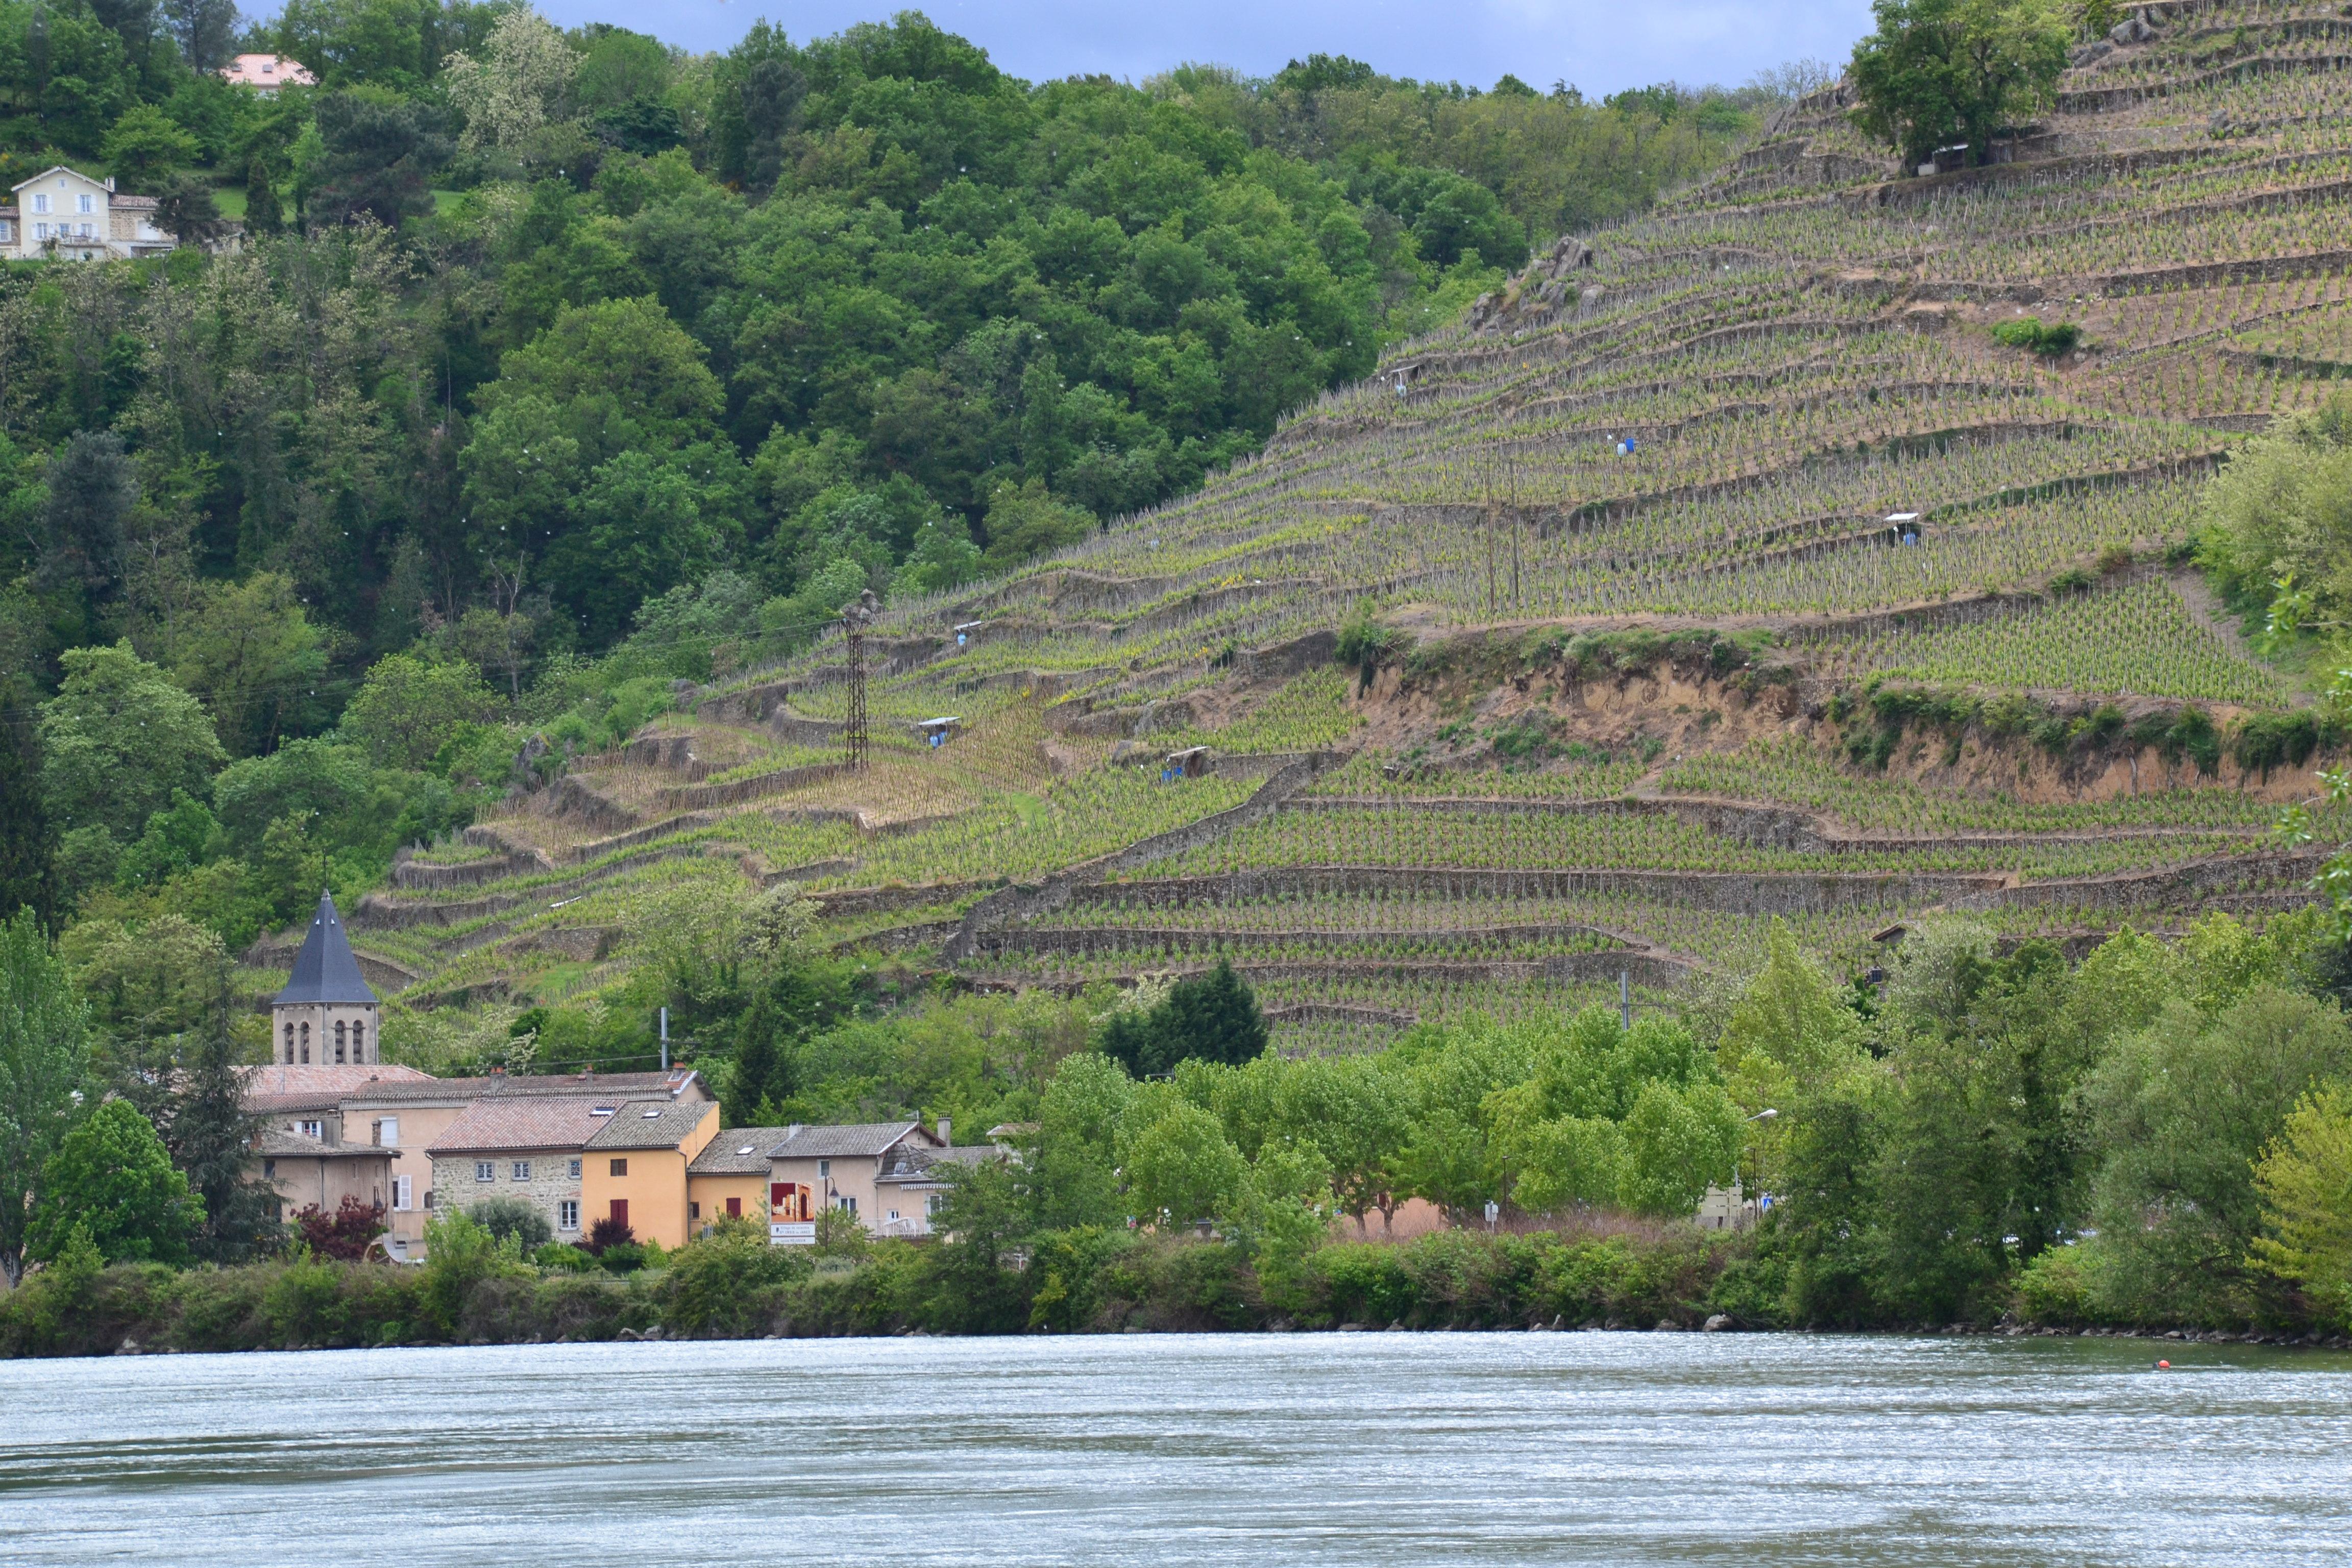 Wine stay in the Rhone valley - Rhone Valley - Wine Region - 1